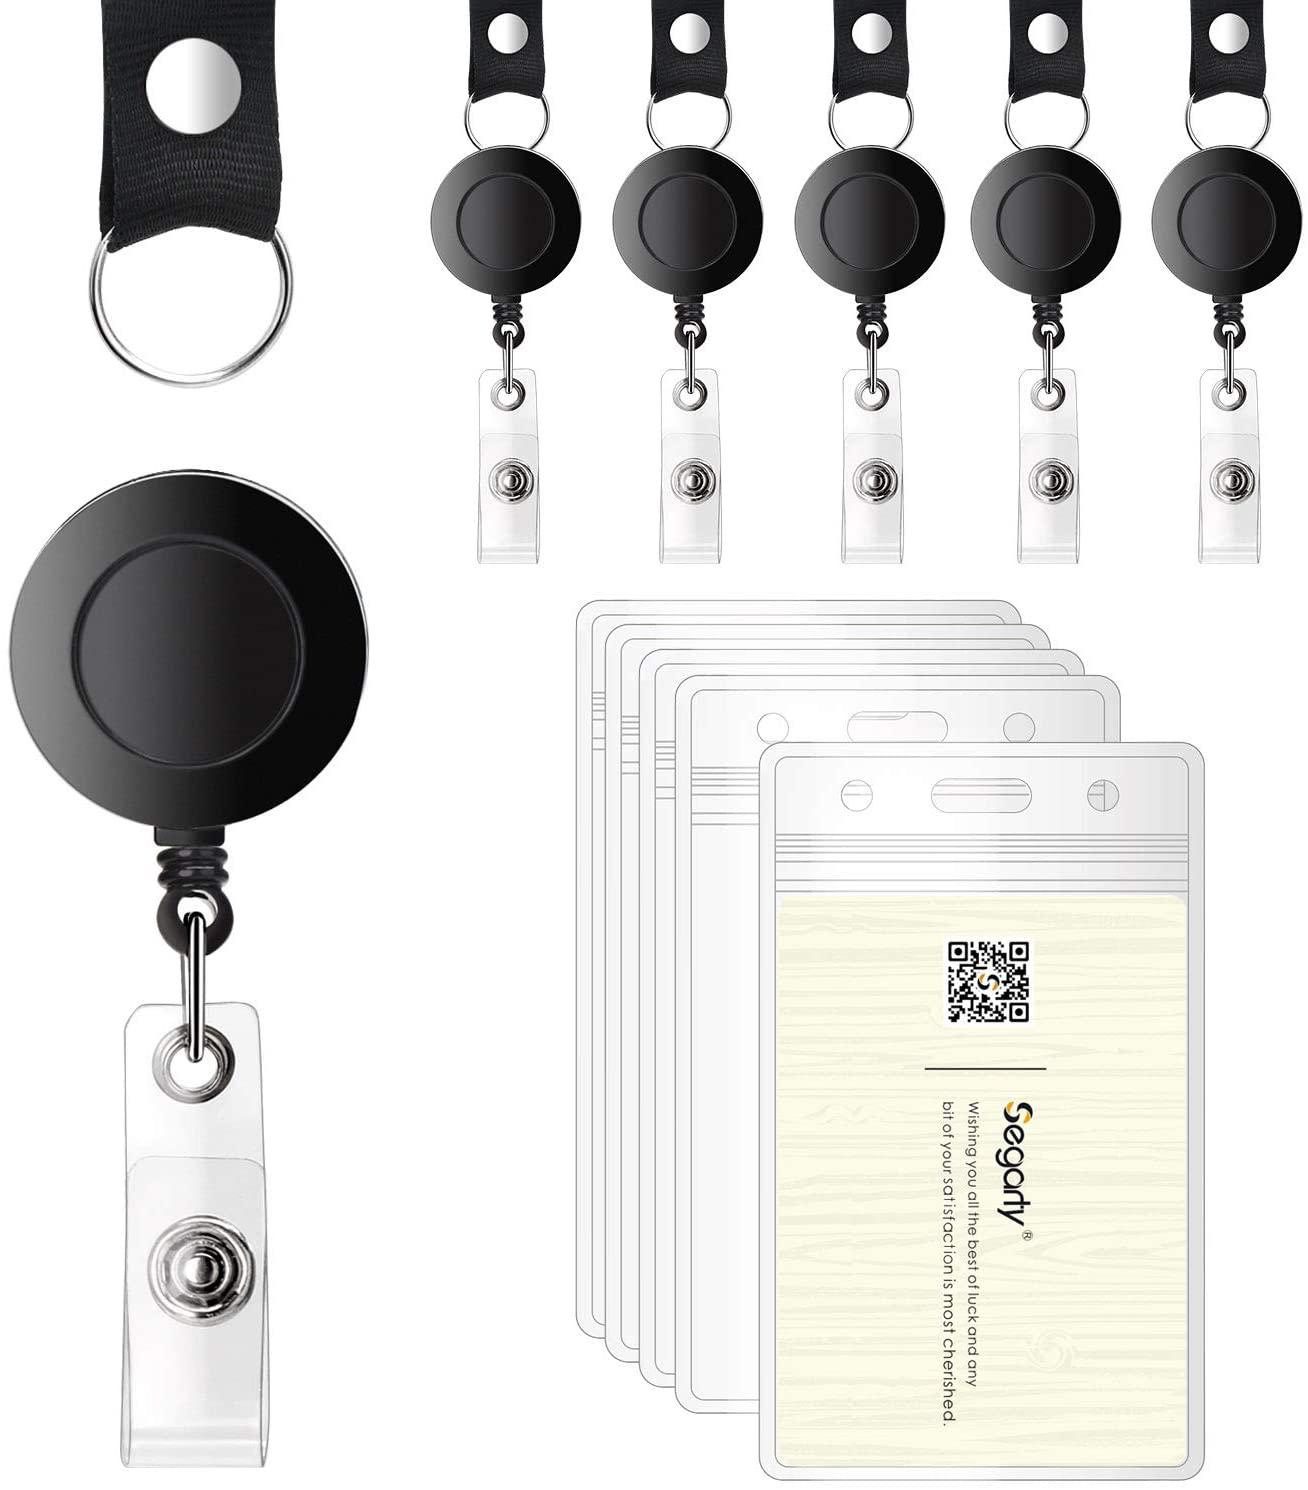 20 Pack Retractable Reel ID Badge Card Holder, Segarty Horizontal ID Pass Holder with Lanyard Bulk Kit, 30-inch Nylon Badge Reel Cord, Metal Belt Clip, with Heavy Duty Plastic Name Badge Holders